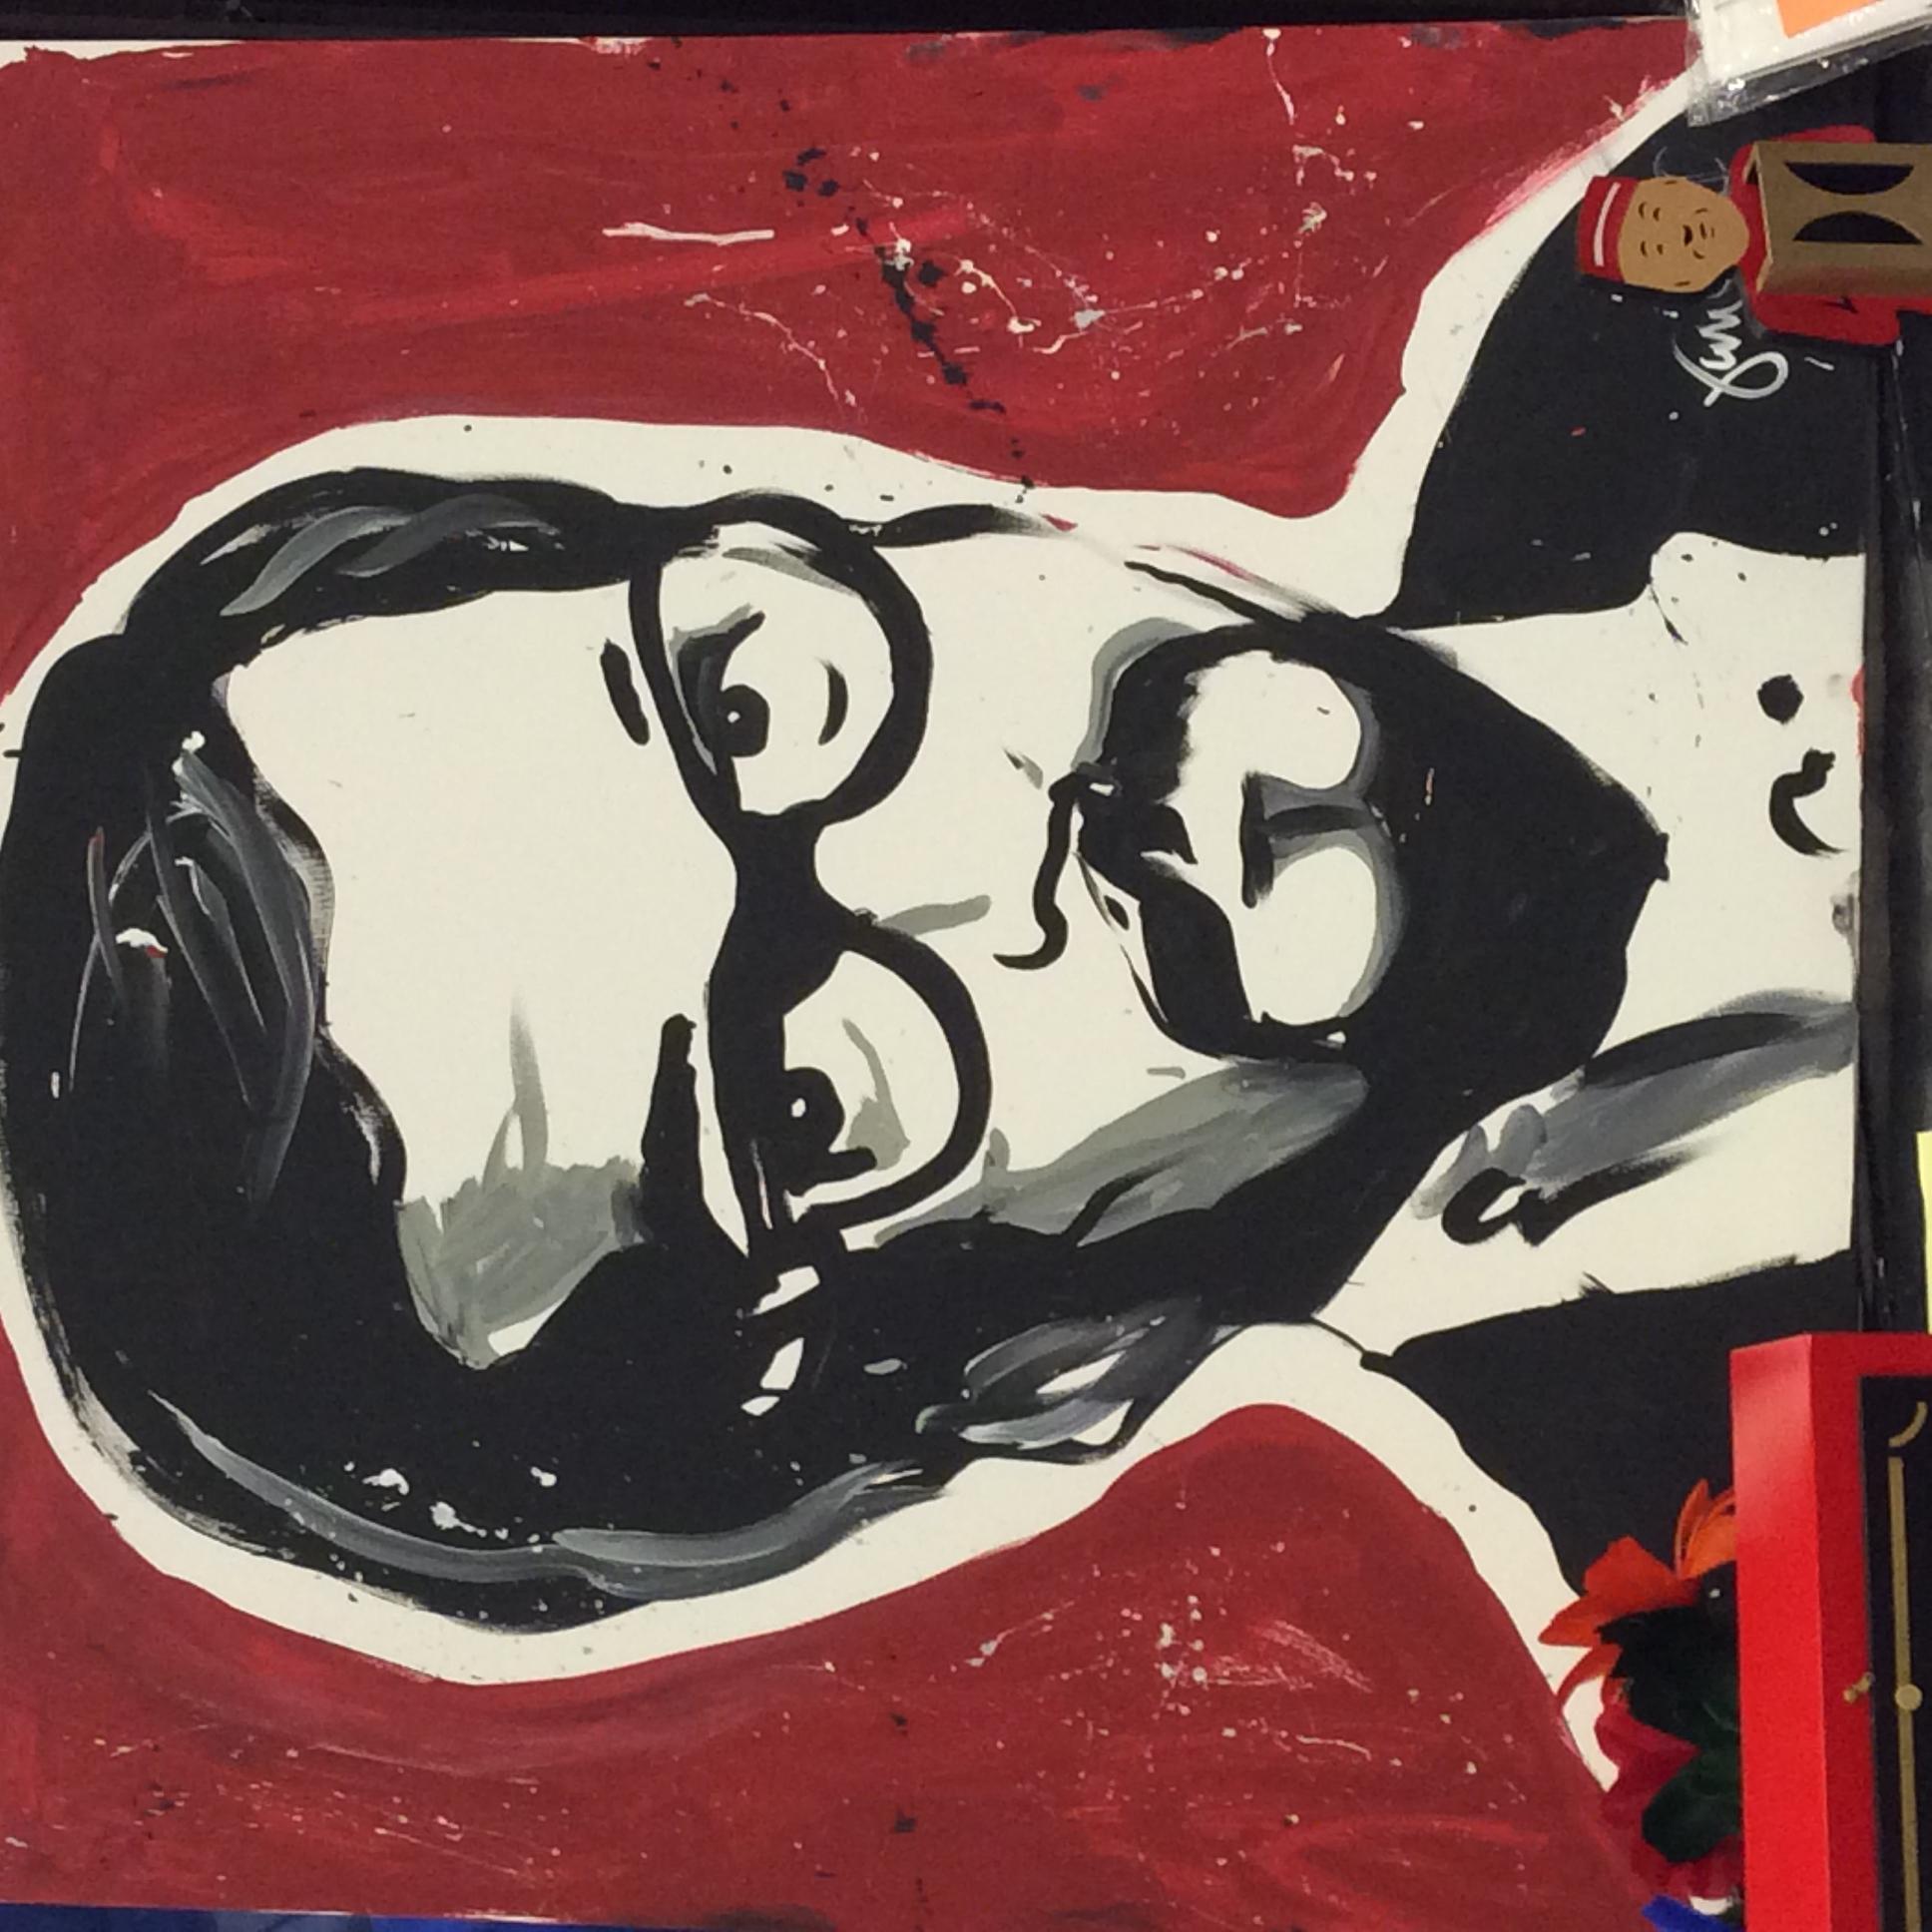 Janski's painting of Blackstone, Jr.